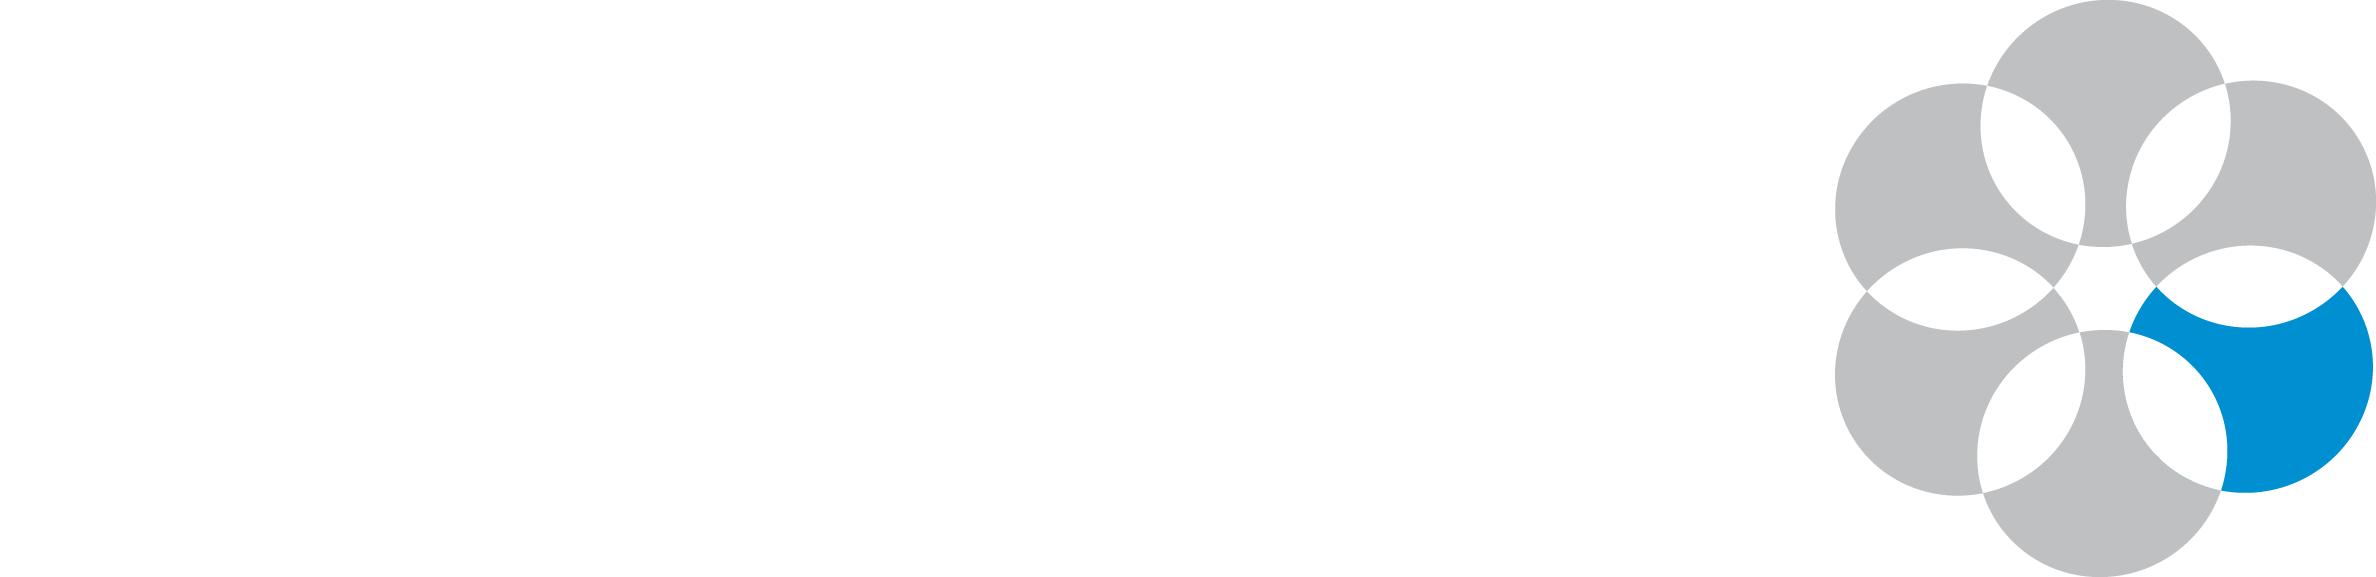 Forum_002_neg_RGB